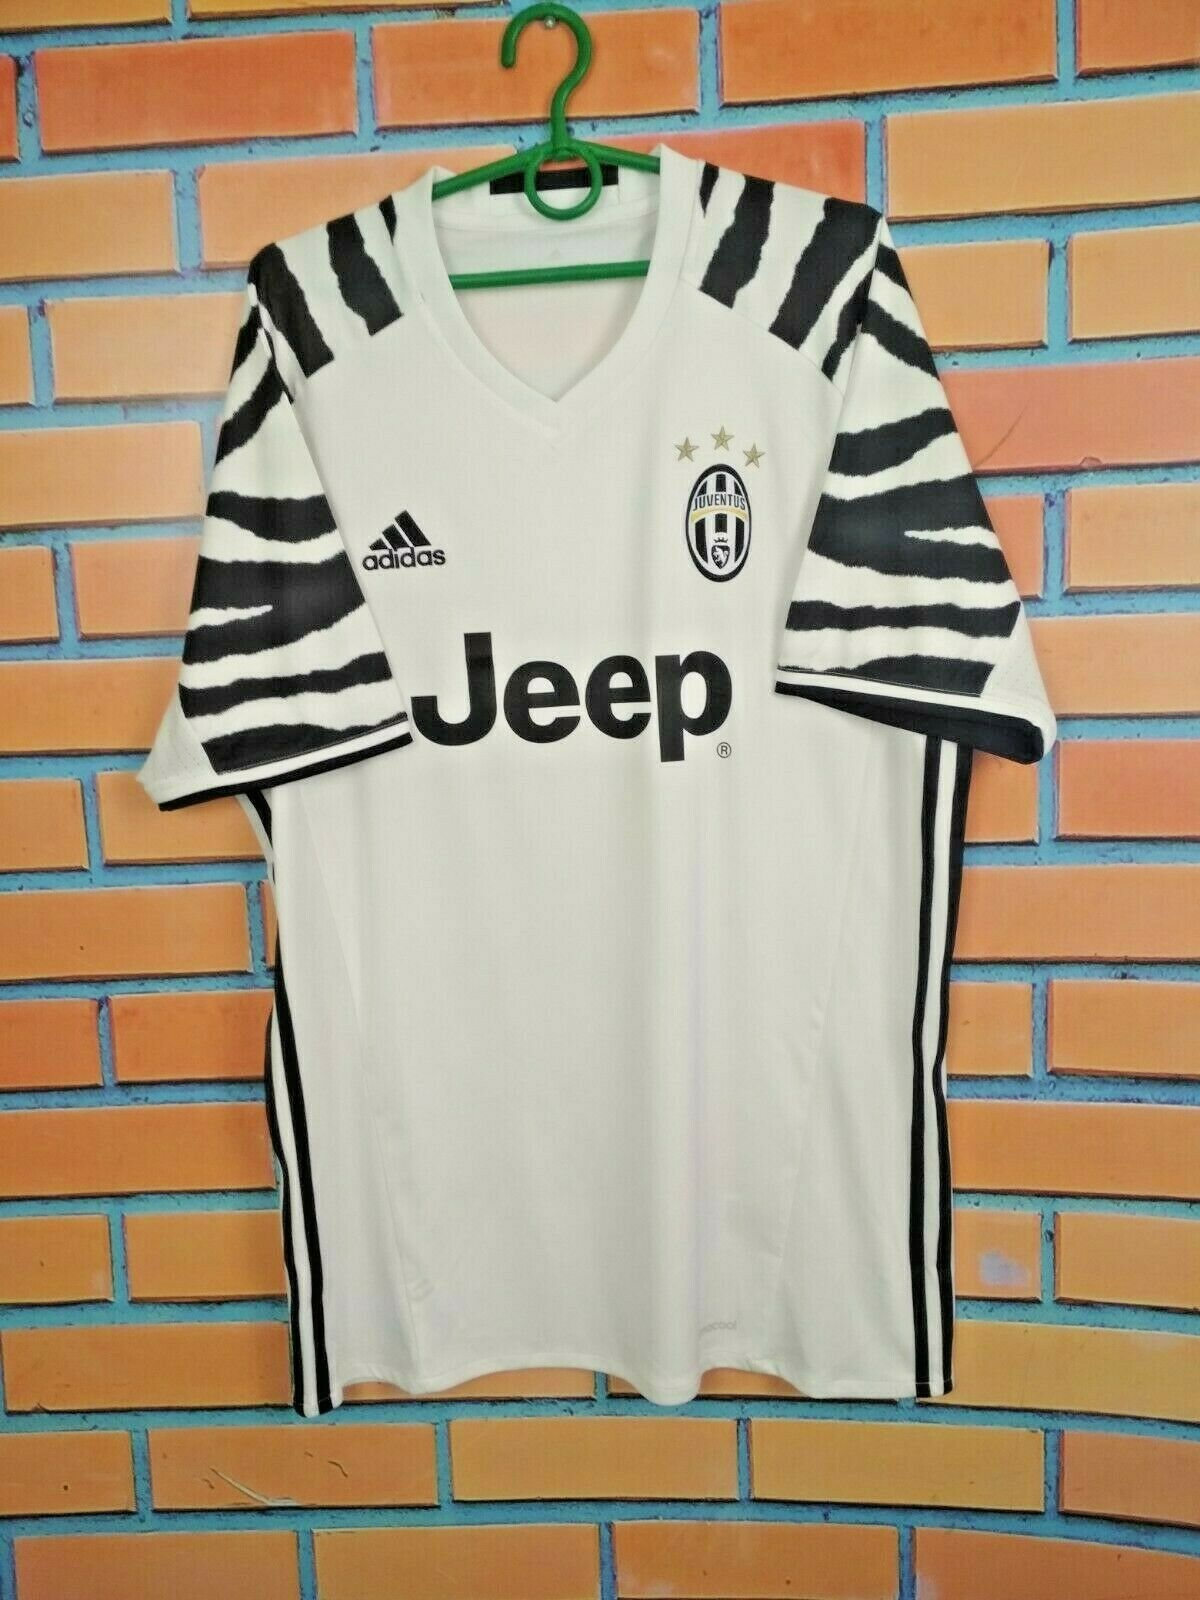 Adidas Juventus 16 17 3rd Shirt Zebra Soccer Jersey Football Ap8906 W Nameset Xs For Sale Online Ebay